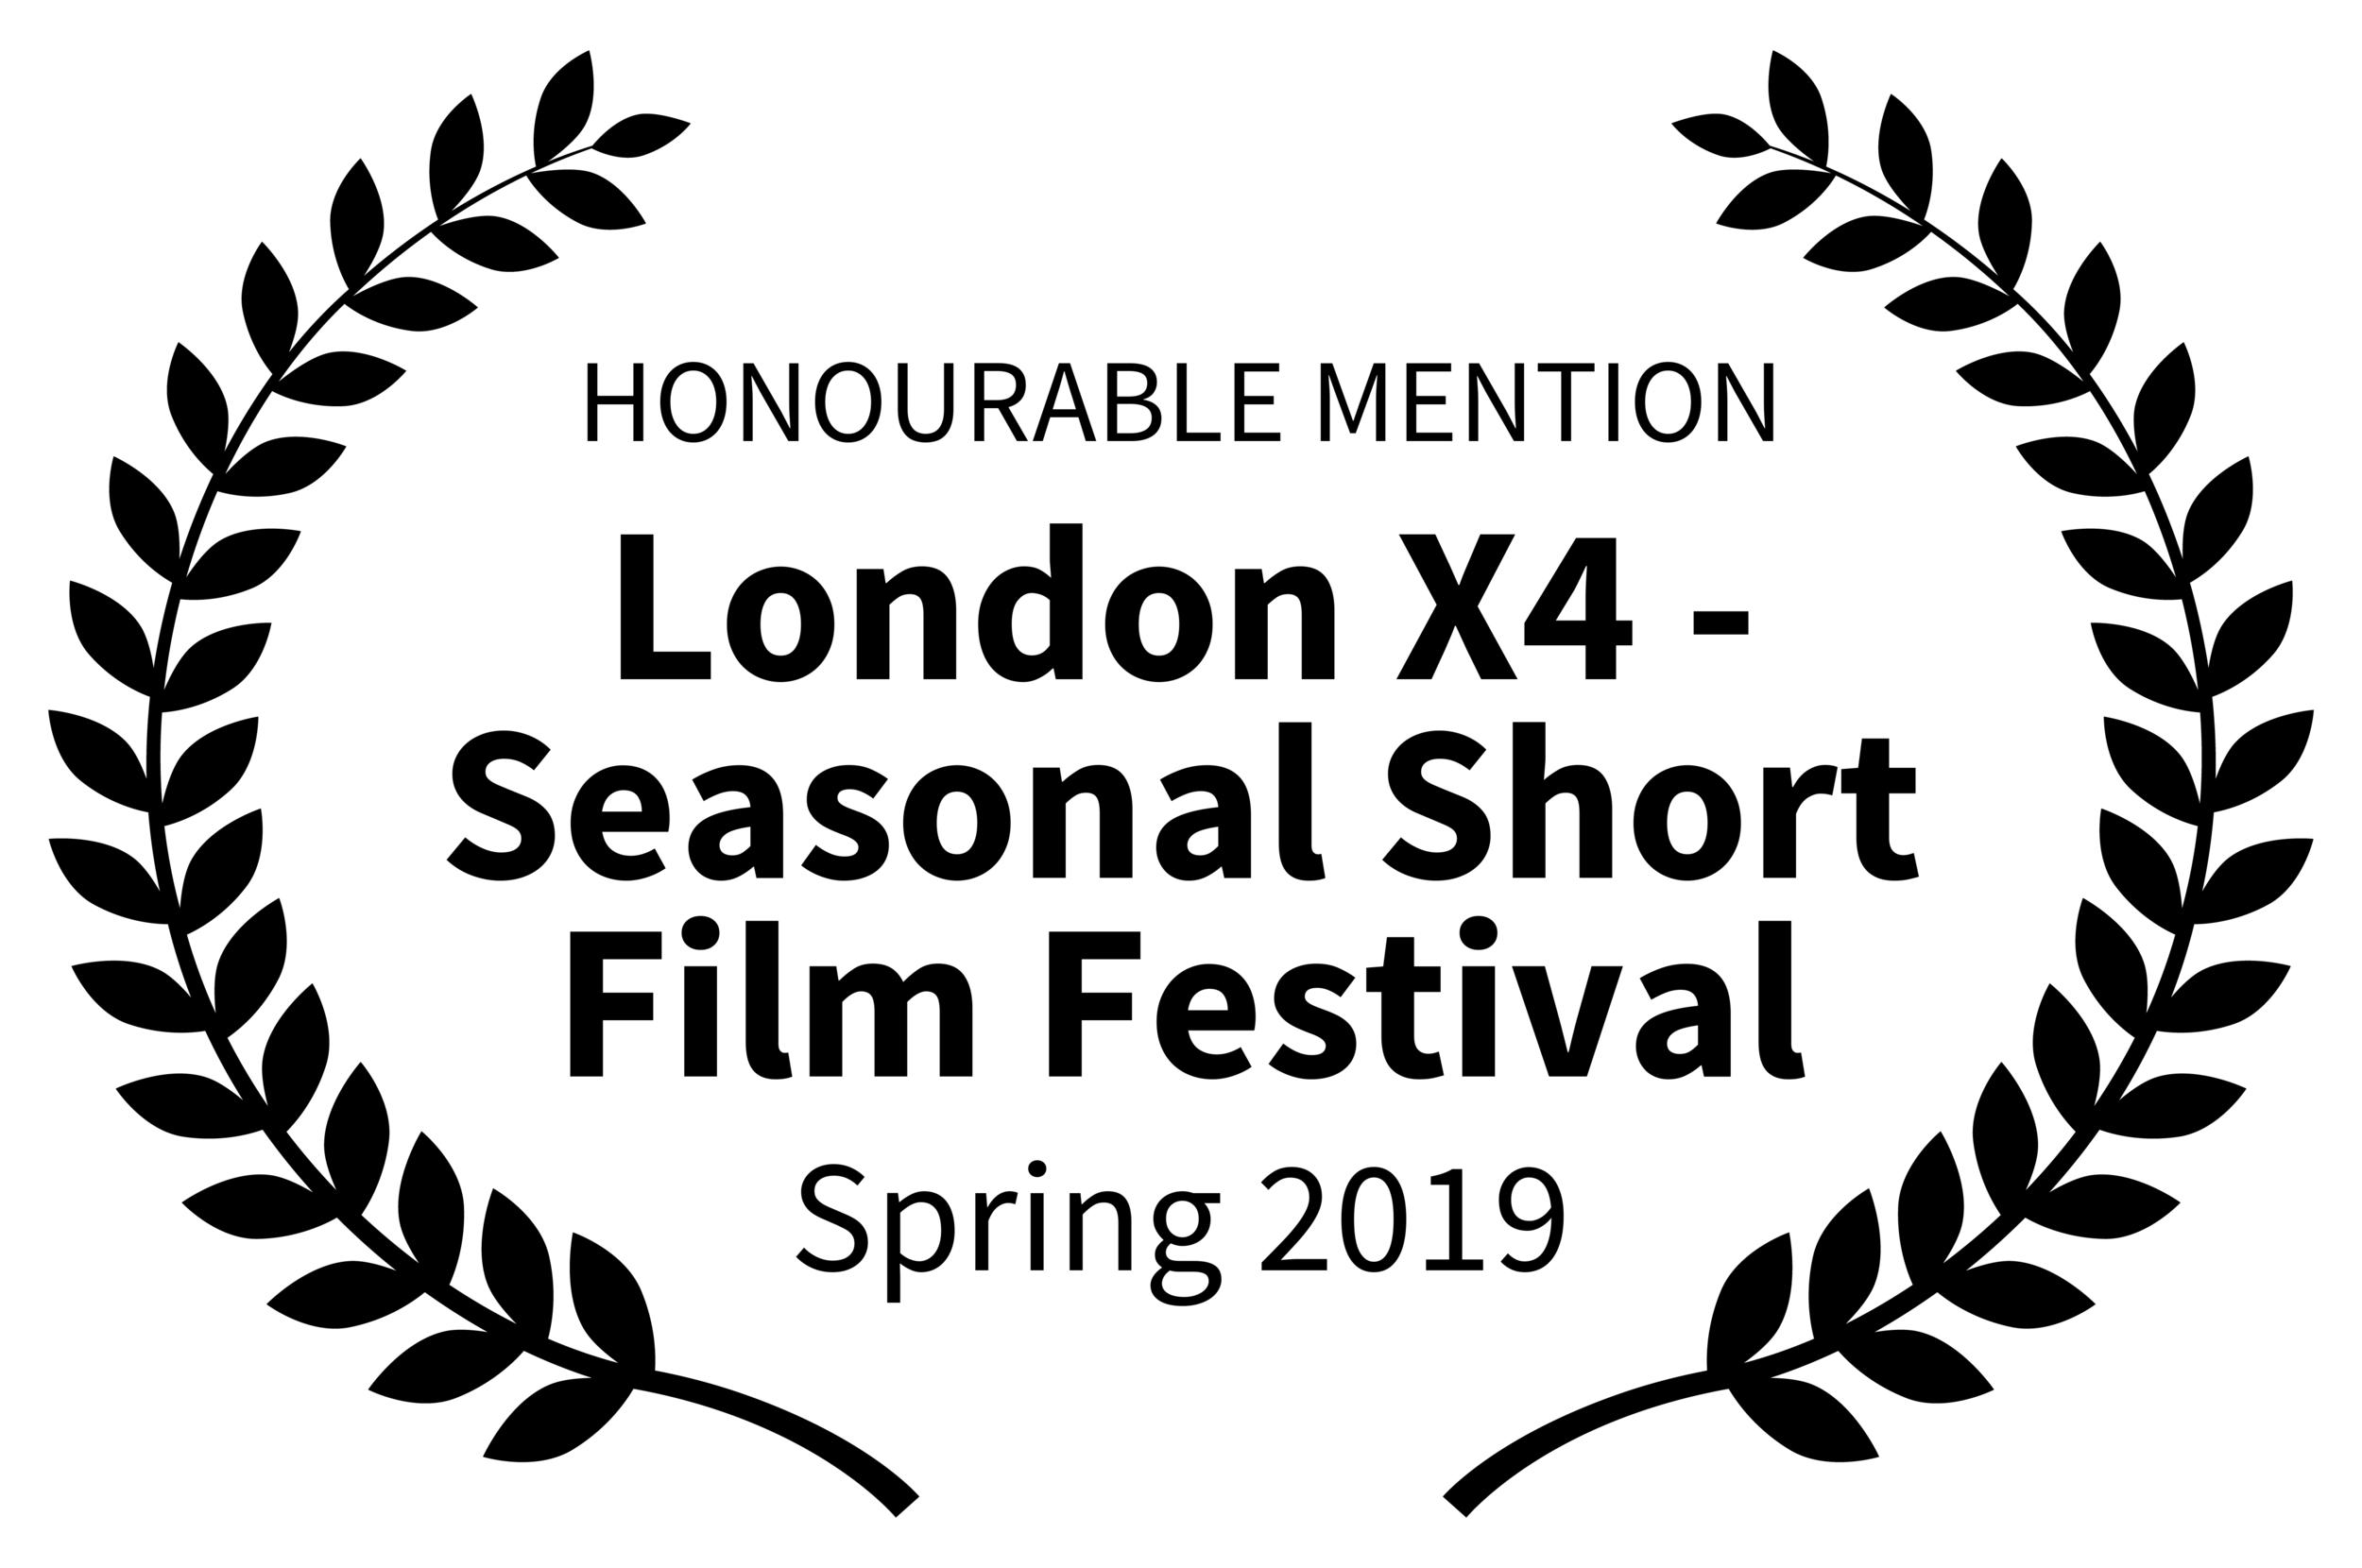 HONOURABLEMENTION-LondonX4-SeasonalShortFilmFestival-Spring2019.png